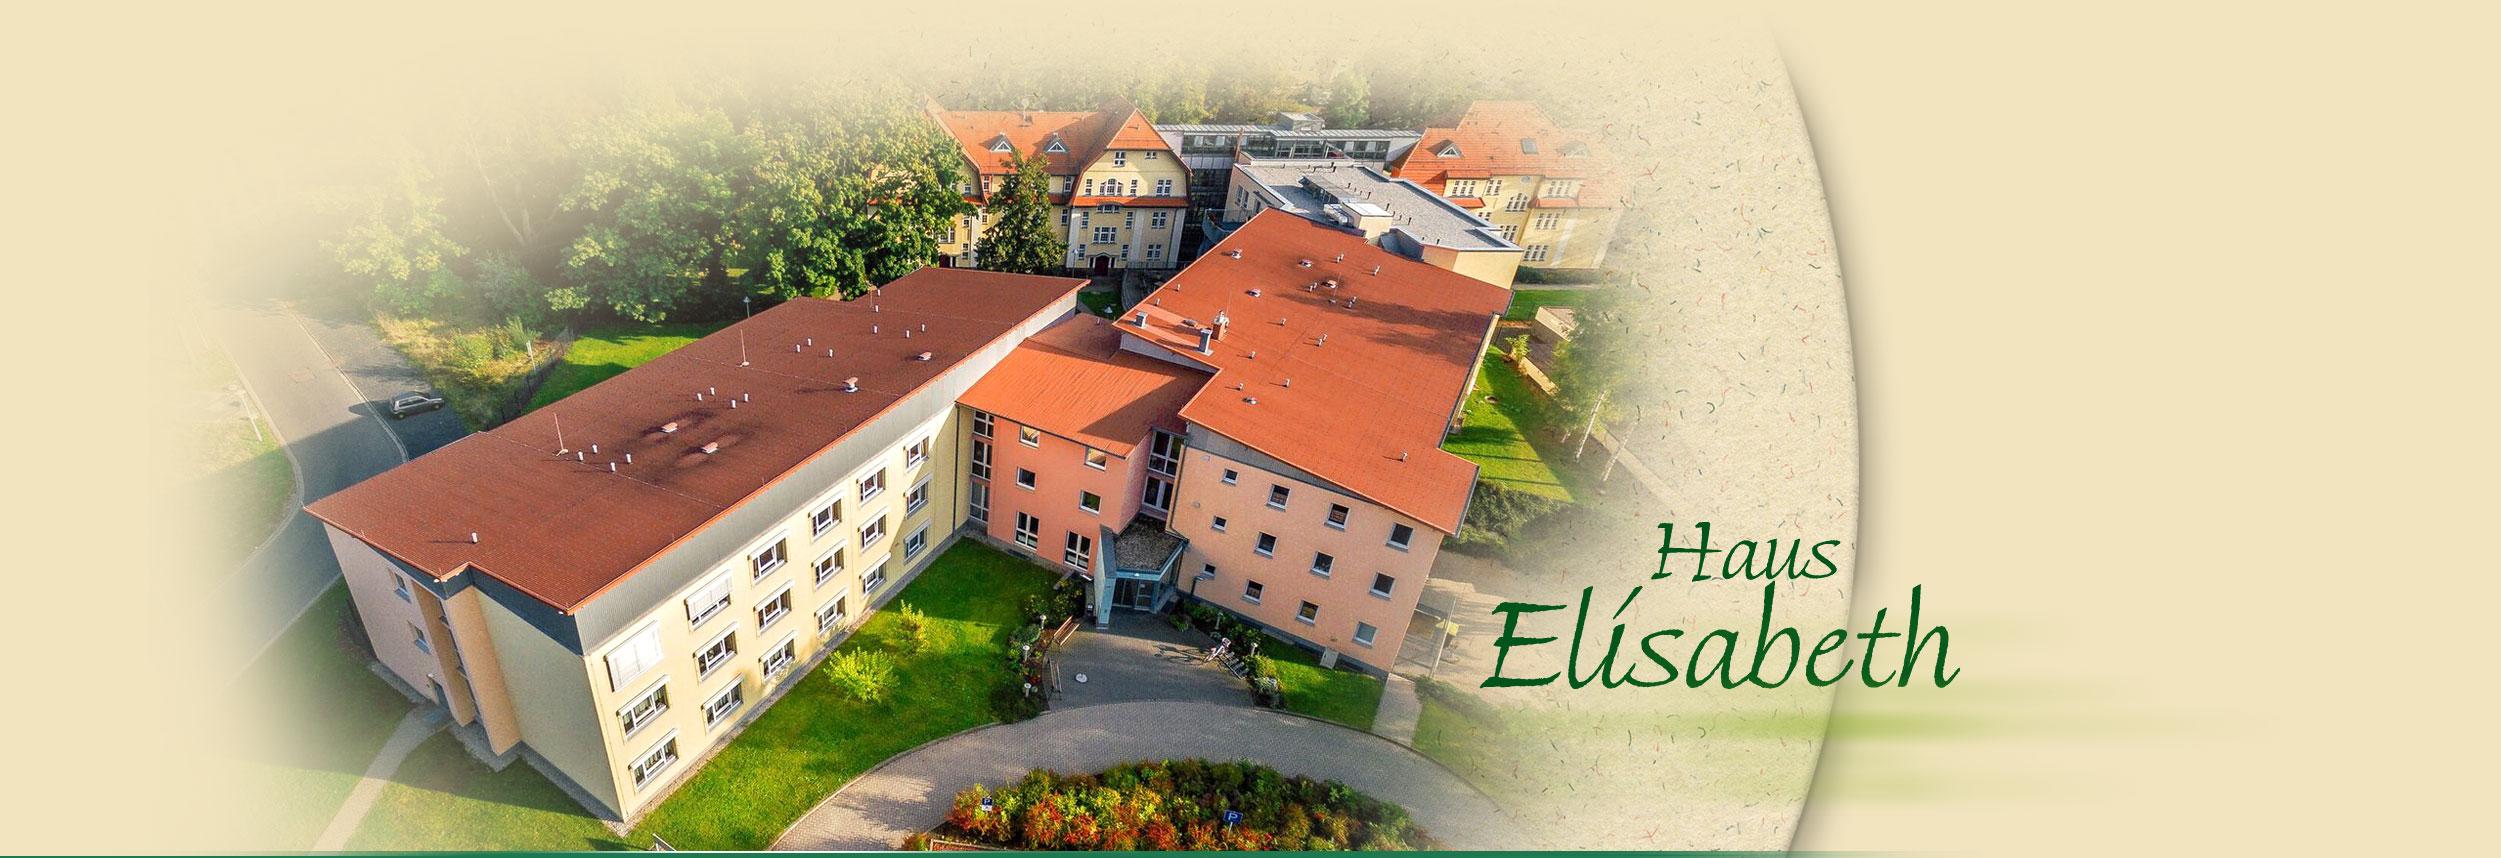 Haus Elisabeth - Seniorenheime Freiberg gGmbH